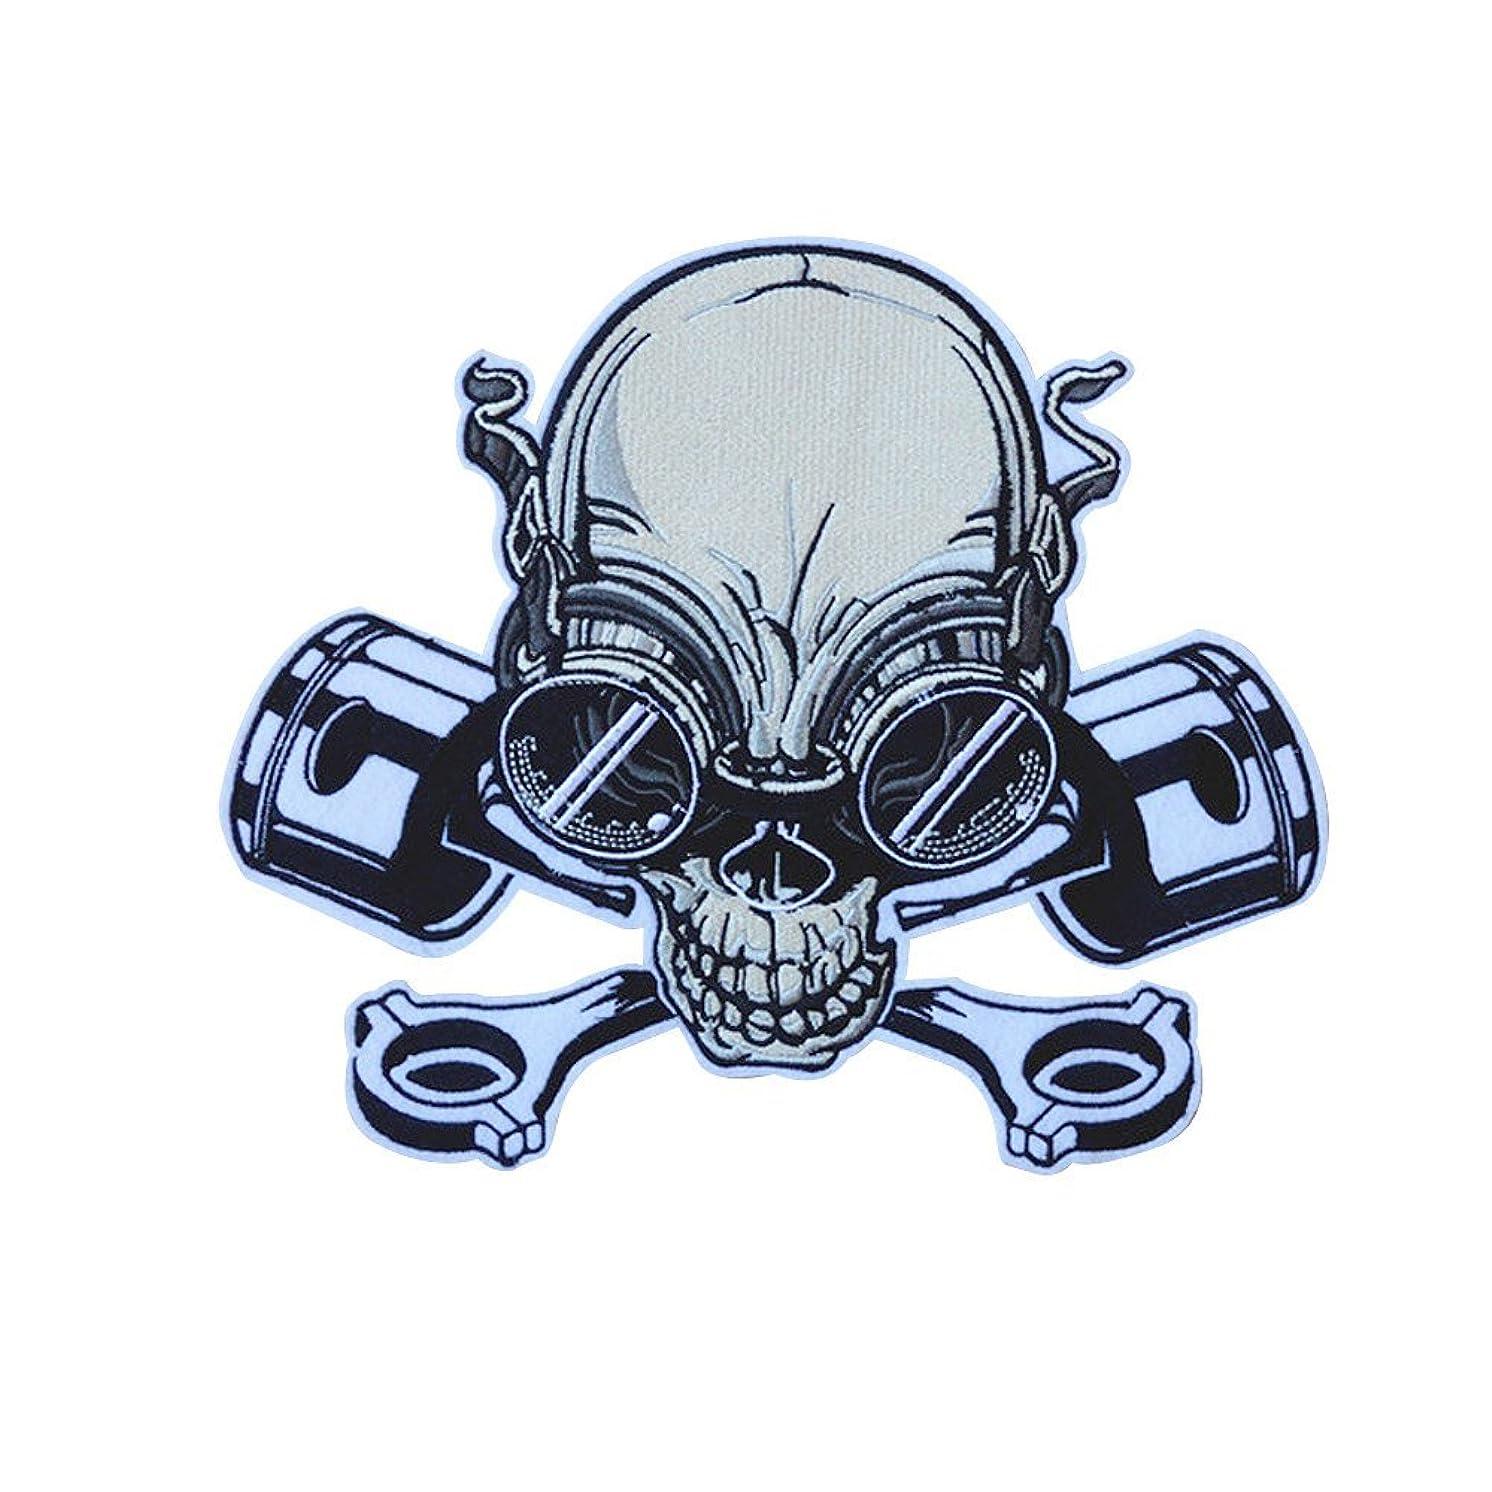 Riverbyland Iron On Biker Patch for Jackets Skull Engine